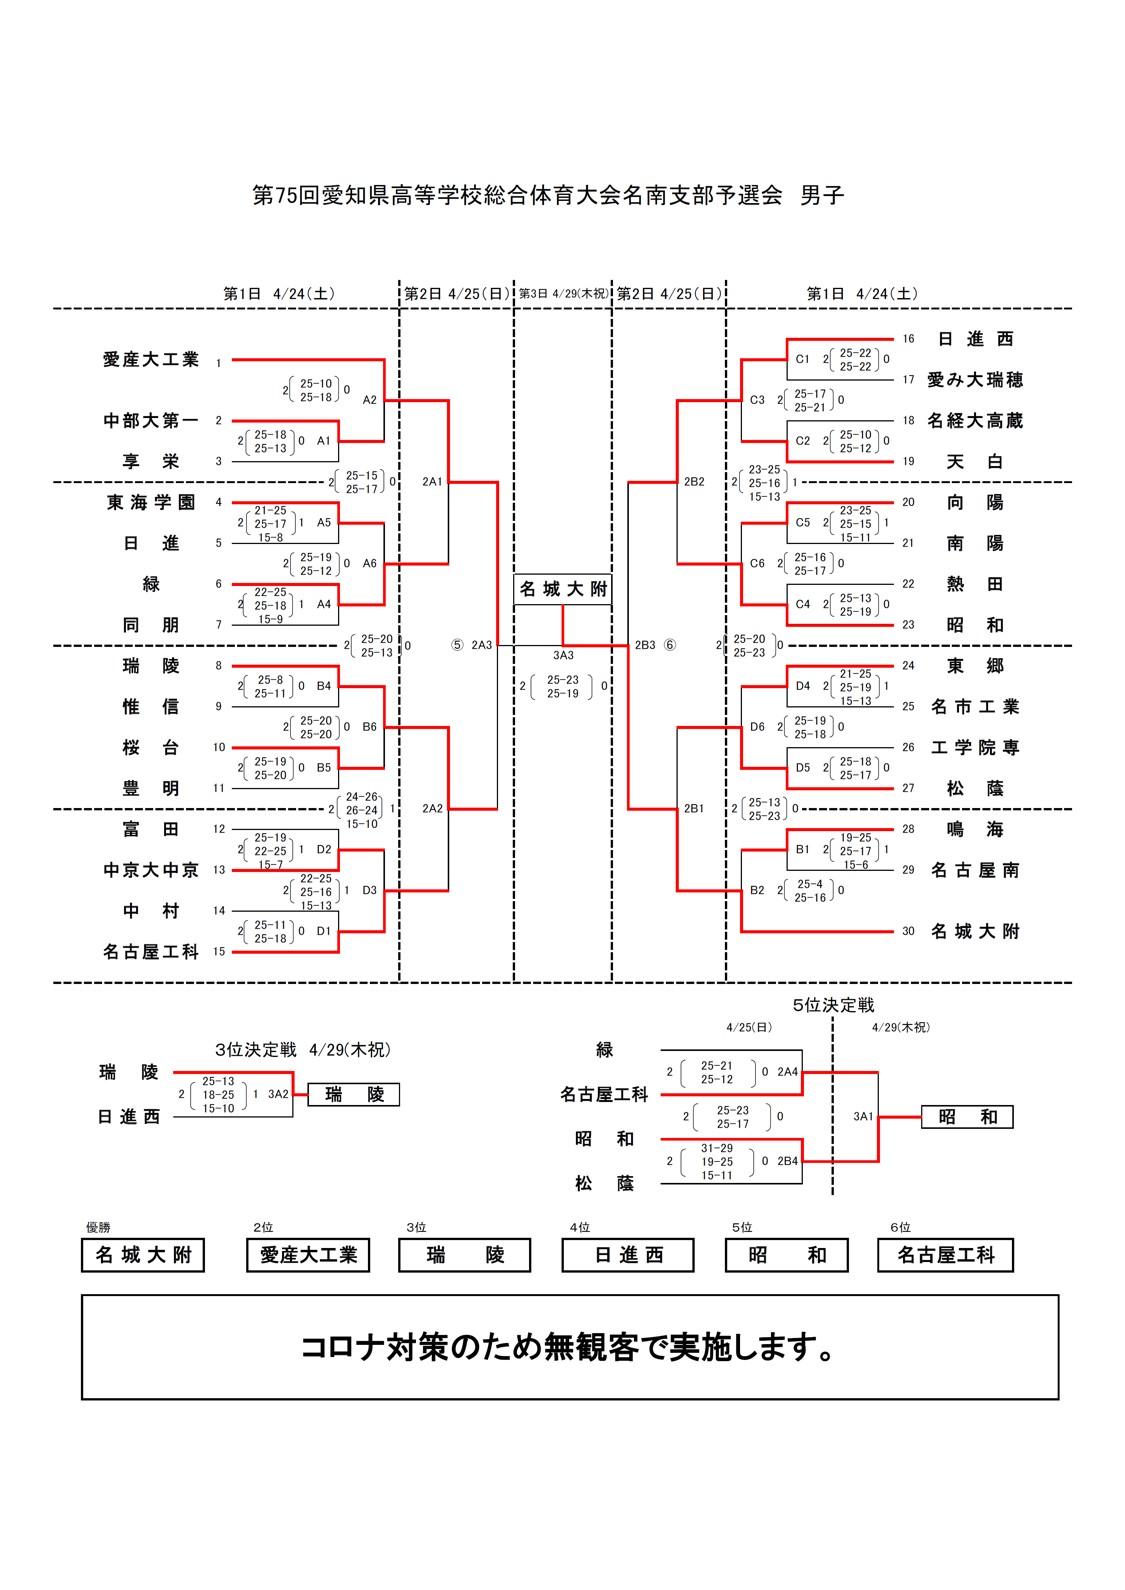 2021年度_インターハイ予選_愛知県_名古屋南地区_男子_結果